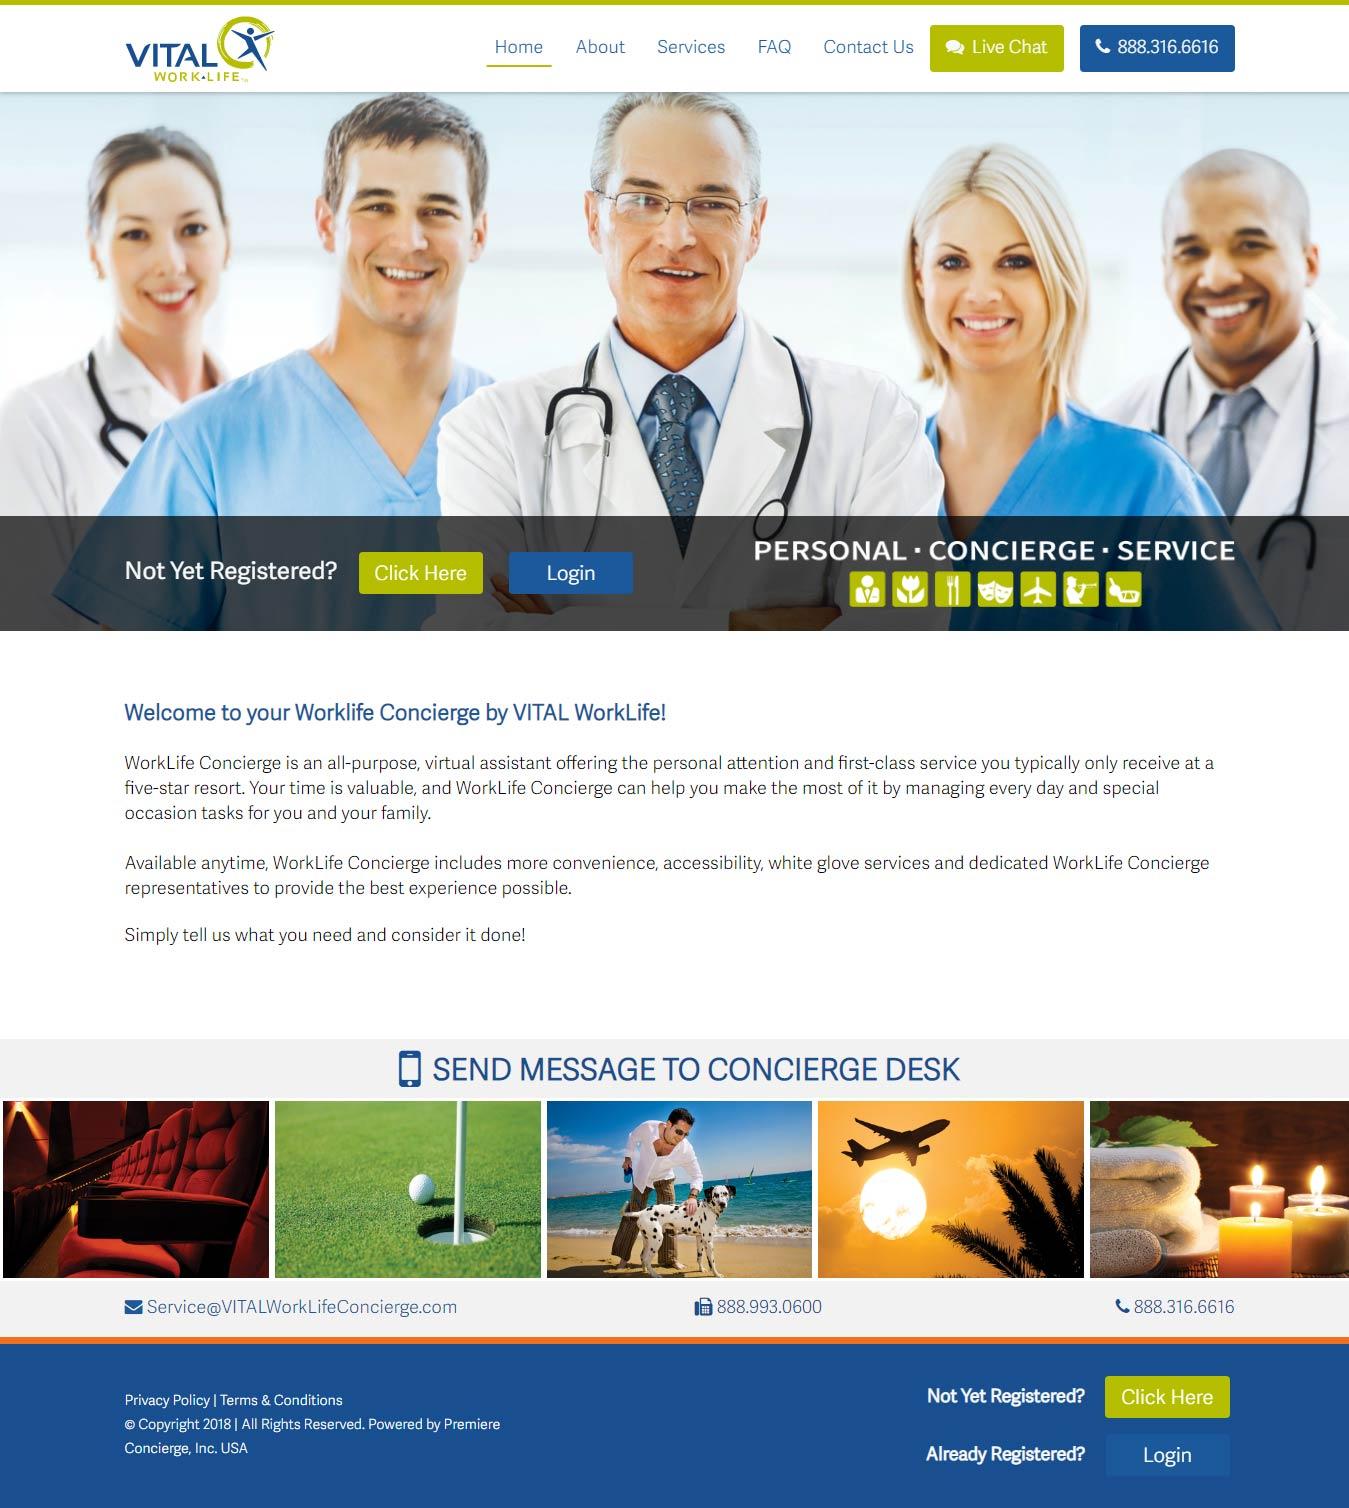 VITAL-WorkLife-Concierge